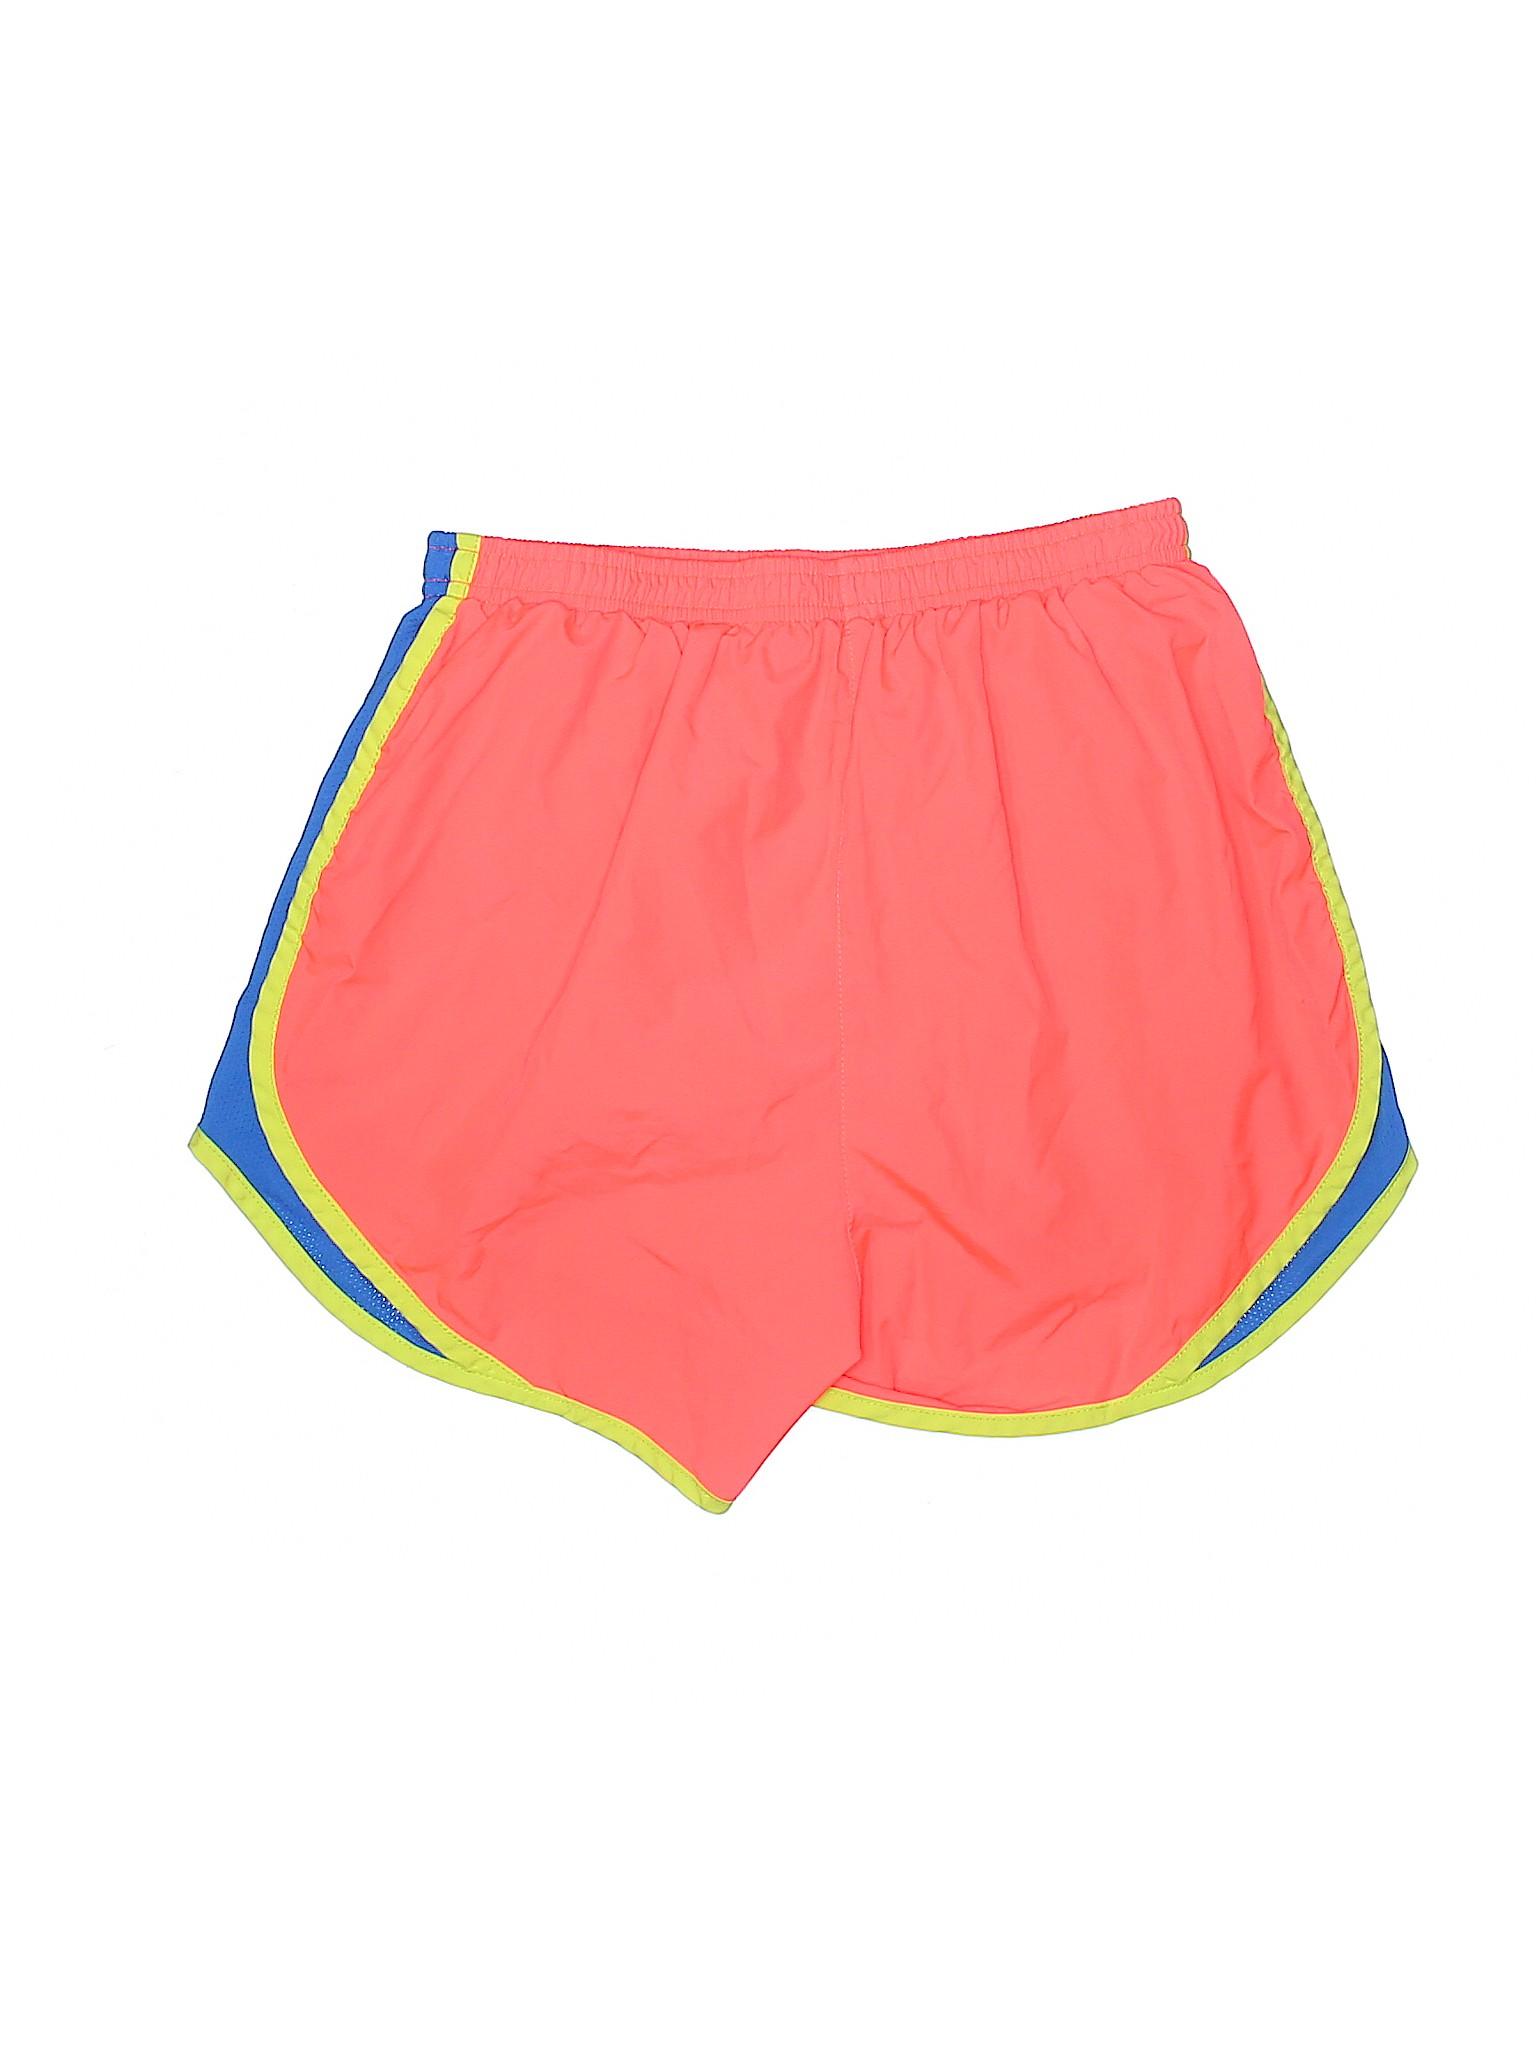 Shorts Athletic Nike Nike Nike Boutique Athletic Shorts Shorts Nike Boutique Athletic Athletic Boutique Boutique XZPPHnxr